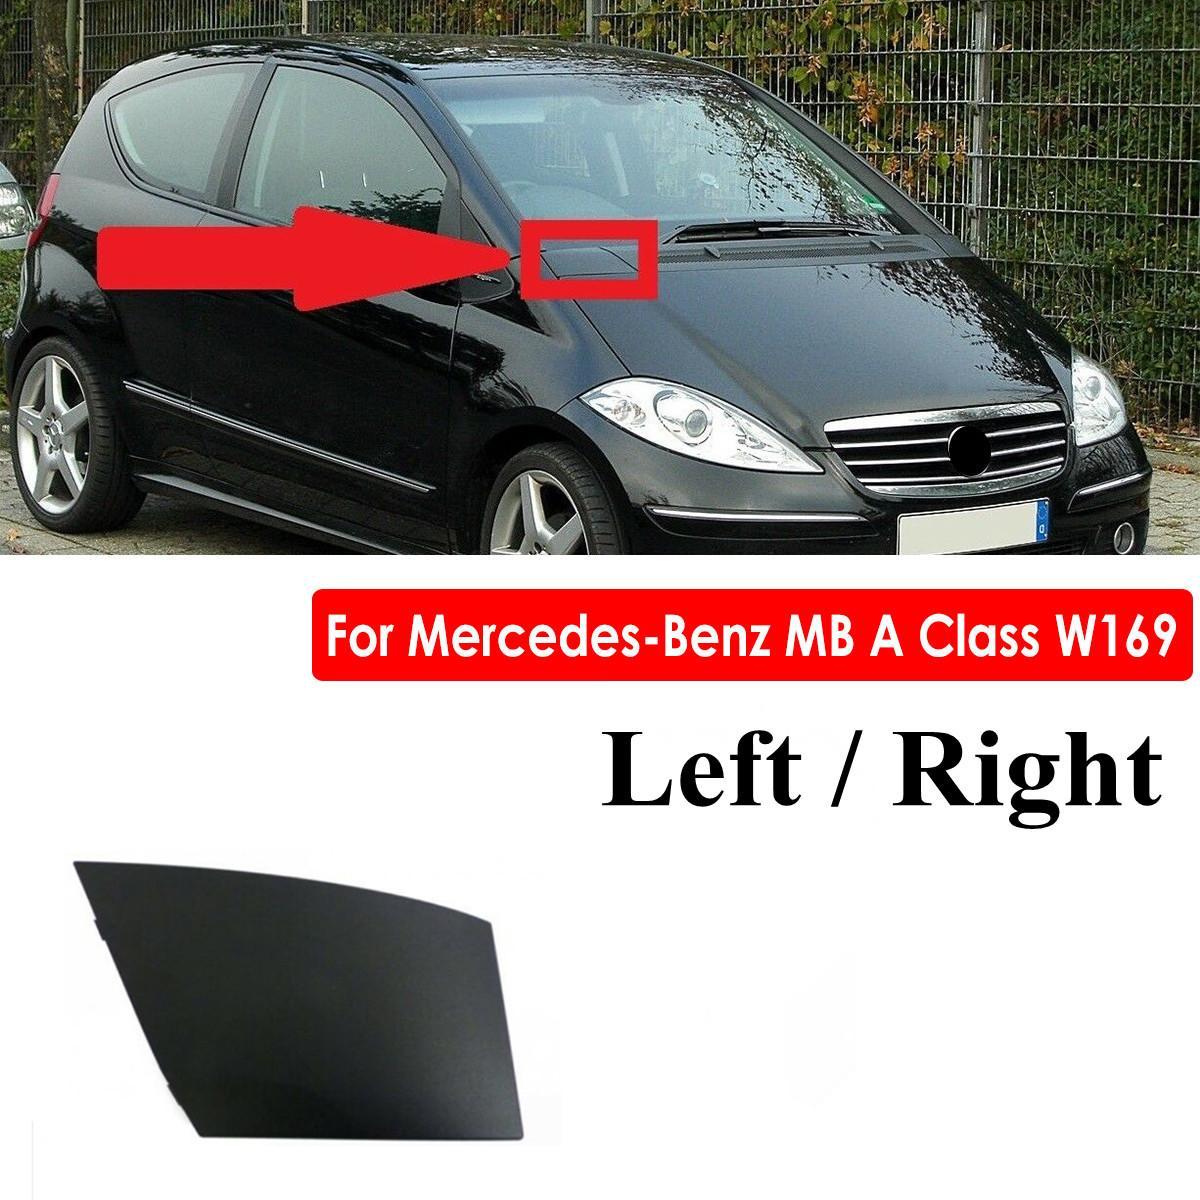 Cubierta izquierda/parte derecha del motor, cubierta de bisagra, tapa de drenaje de agua, protector de esquina para Mercedes para Benz MB A Class W169